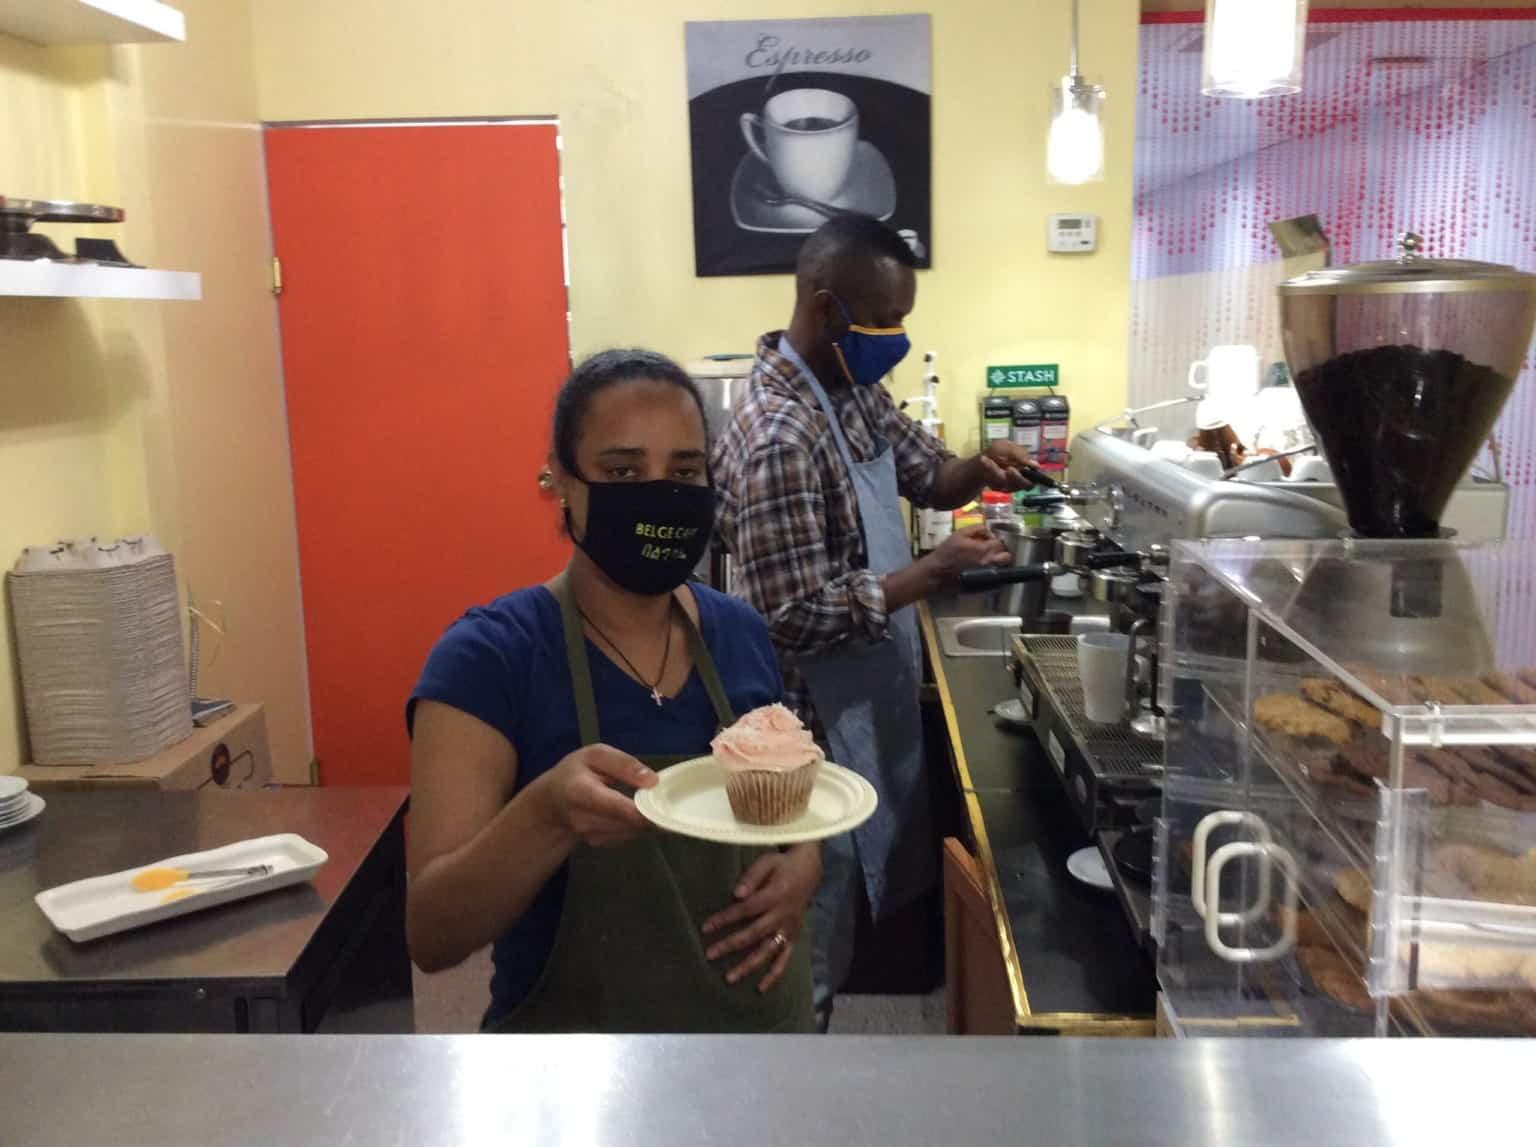 Belge Yimenu (front) and Abiy Andeyhun (back) serve a vegan cupcake specialty at Belge Café. | Constance Brissenden